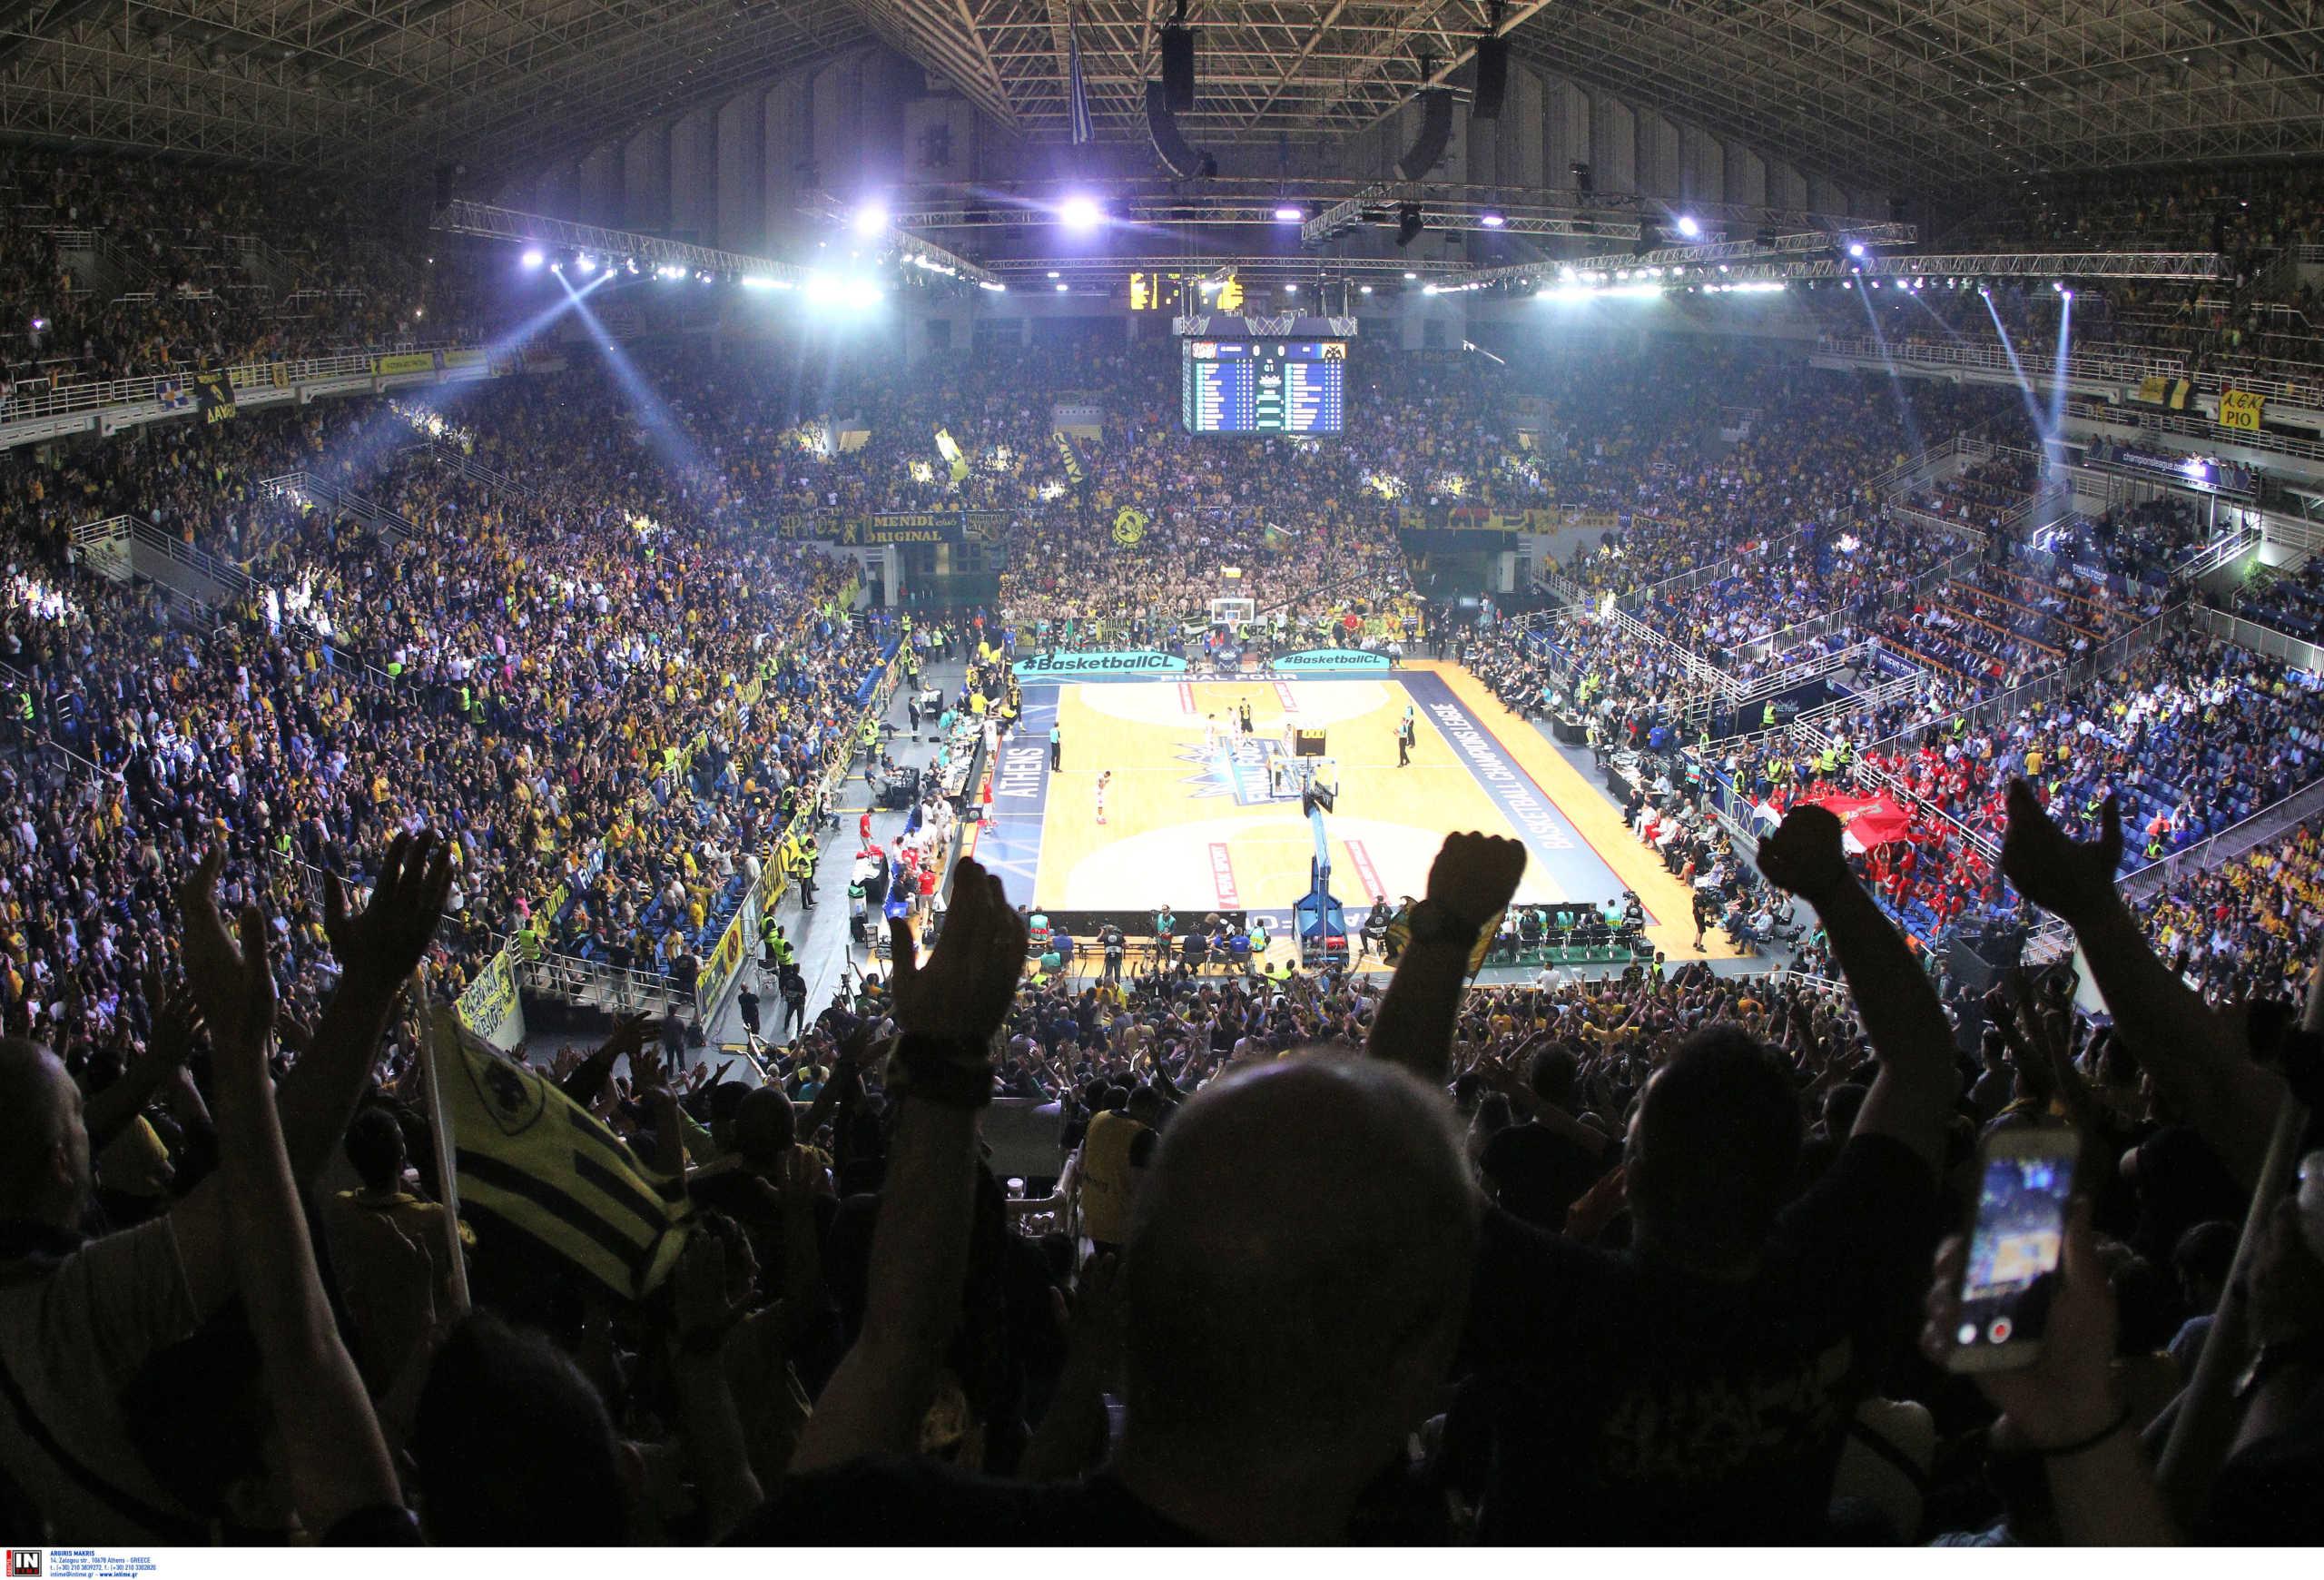 BCL και Αθήνα ετοιμάζονται για μία ιστορική απόφαση λένε στο Ισραήλ